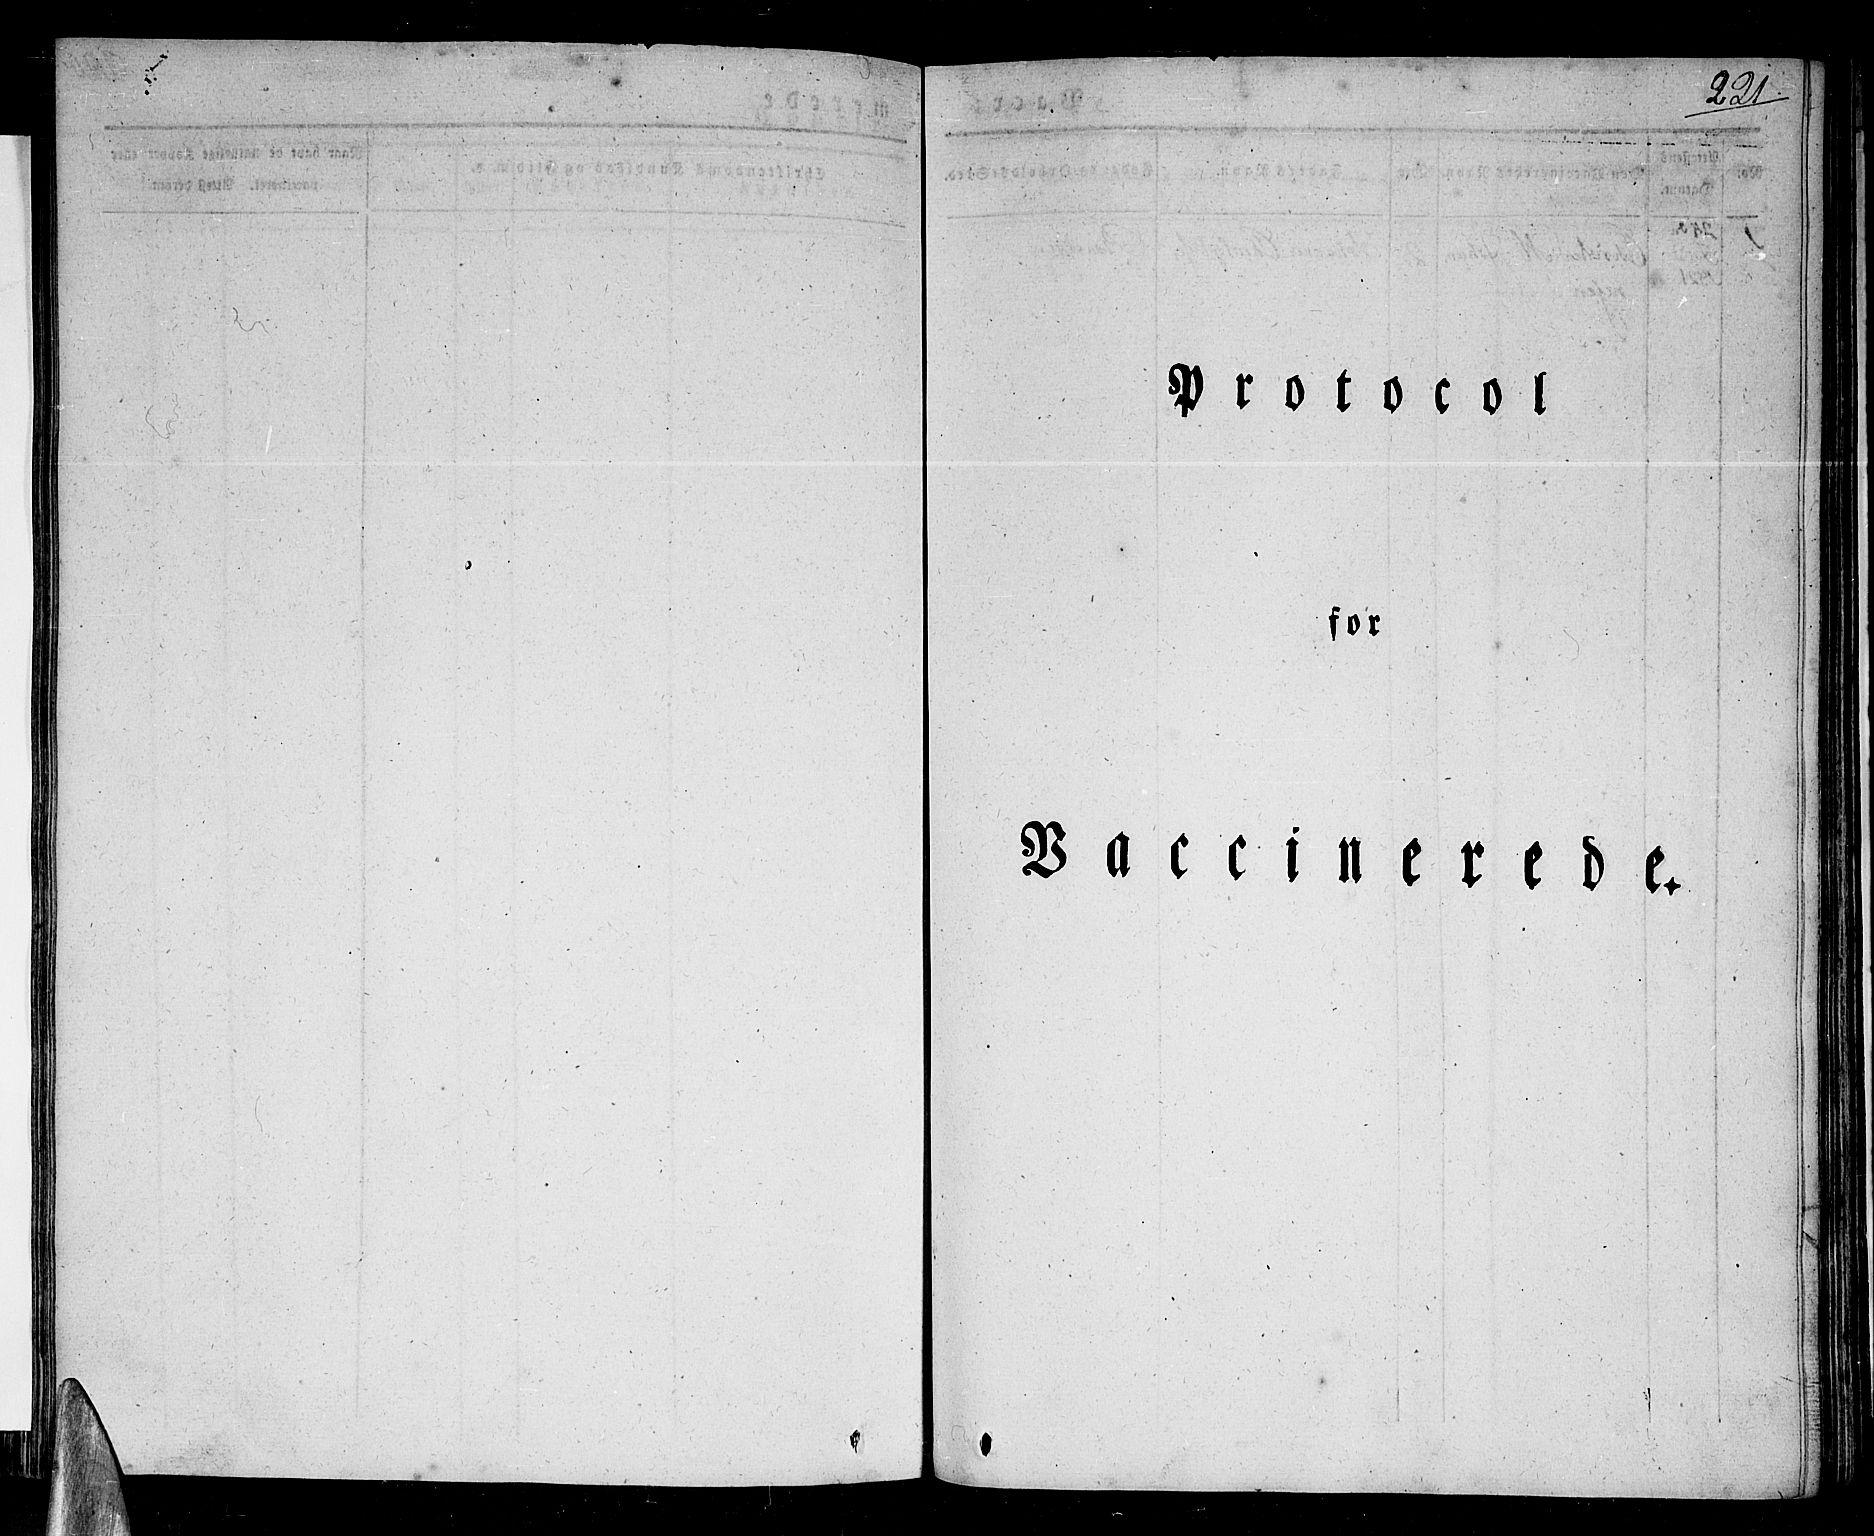 SAT, Ministerialprotokoller, klokkerbøker og fødselsregistre - Nordland, 801/L0006: Ministerialbok nr. 801A06, 1834-1845, s. 221